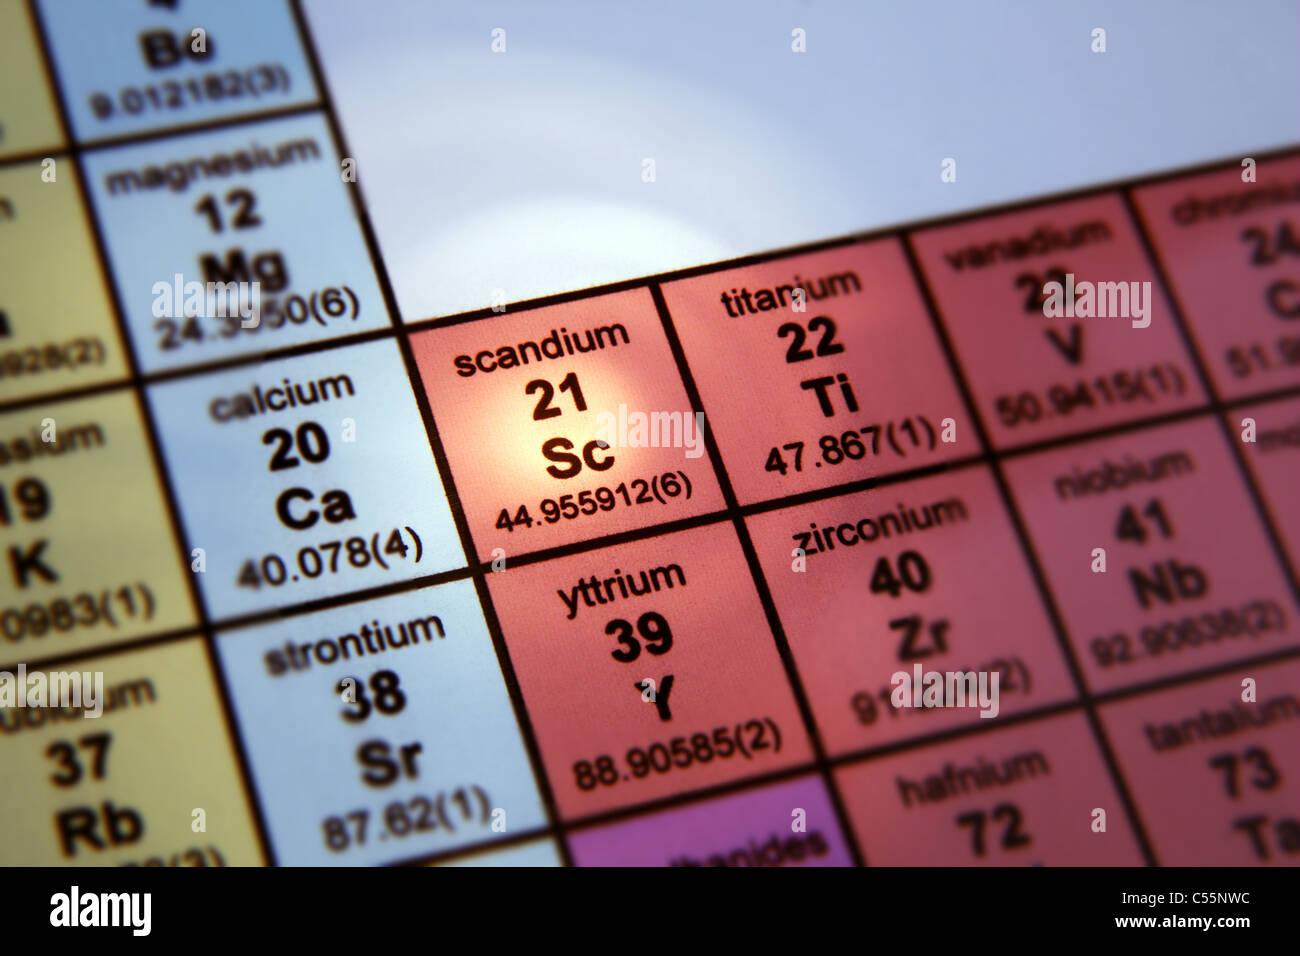 Zirconium on the periodic table gallery periodic table images 39 periodic table gallery periodic table images 39 periodic table gallery periodic table images yttrium on gamestrikefo Gallery